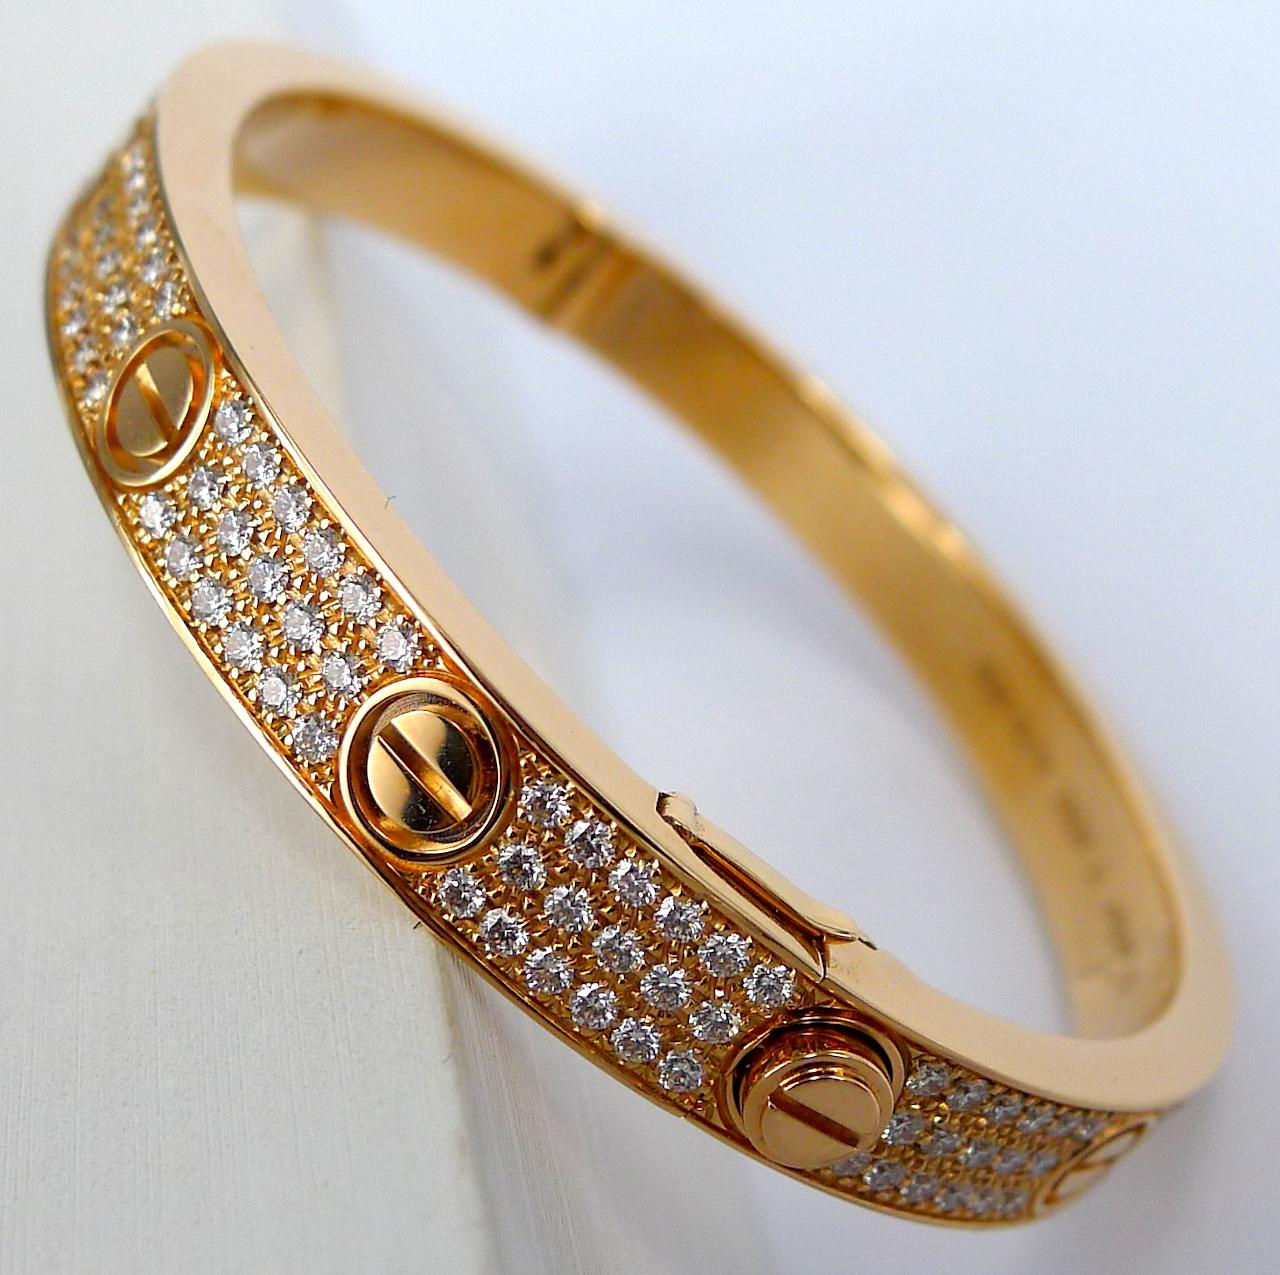 Cartier Love Bracelet Pink Gold Diamond Ref N6036916 New Unworn